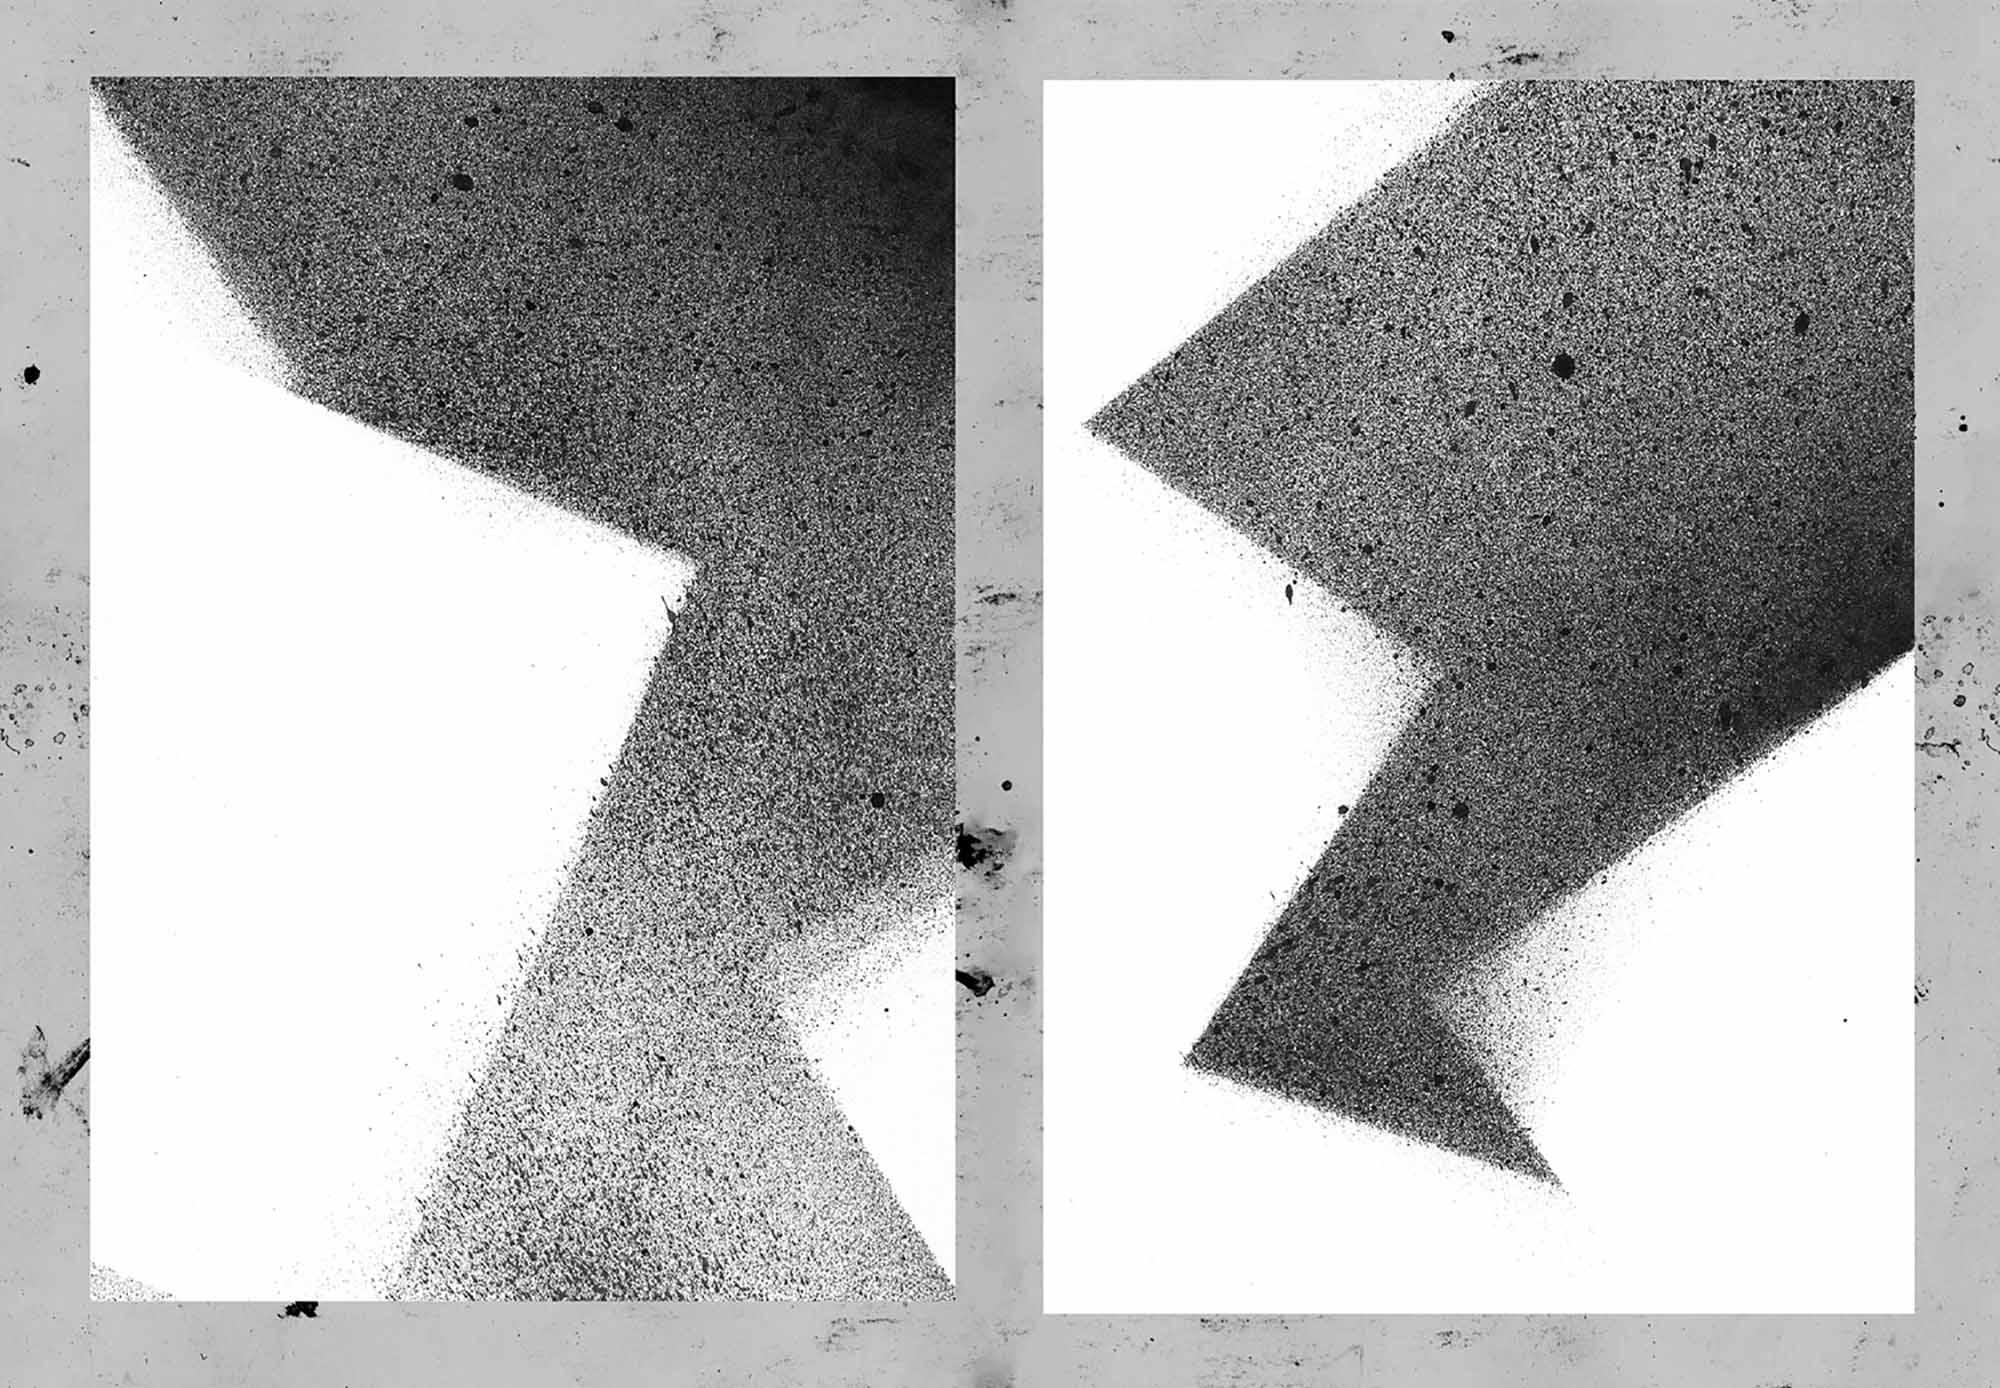 Dusty Inklab Grunge Textures 7